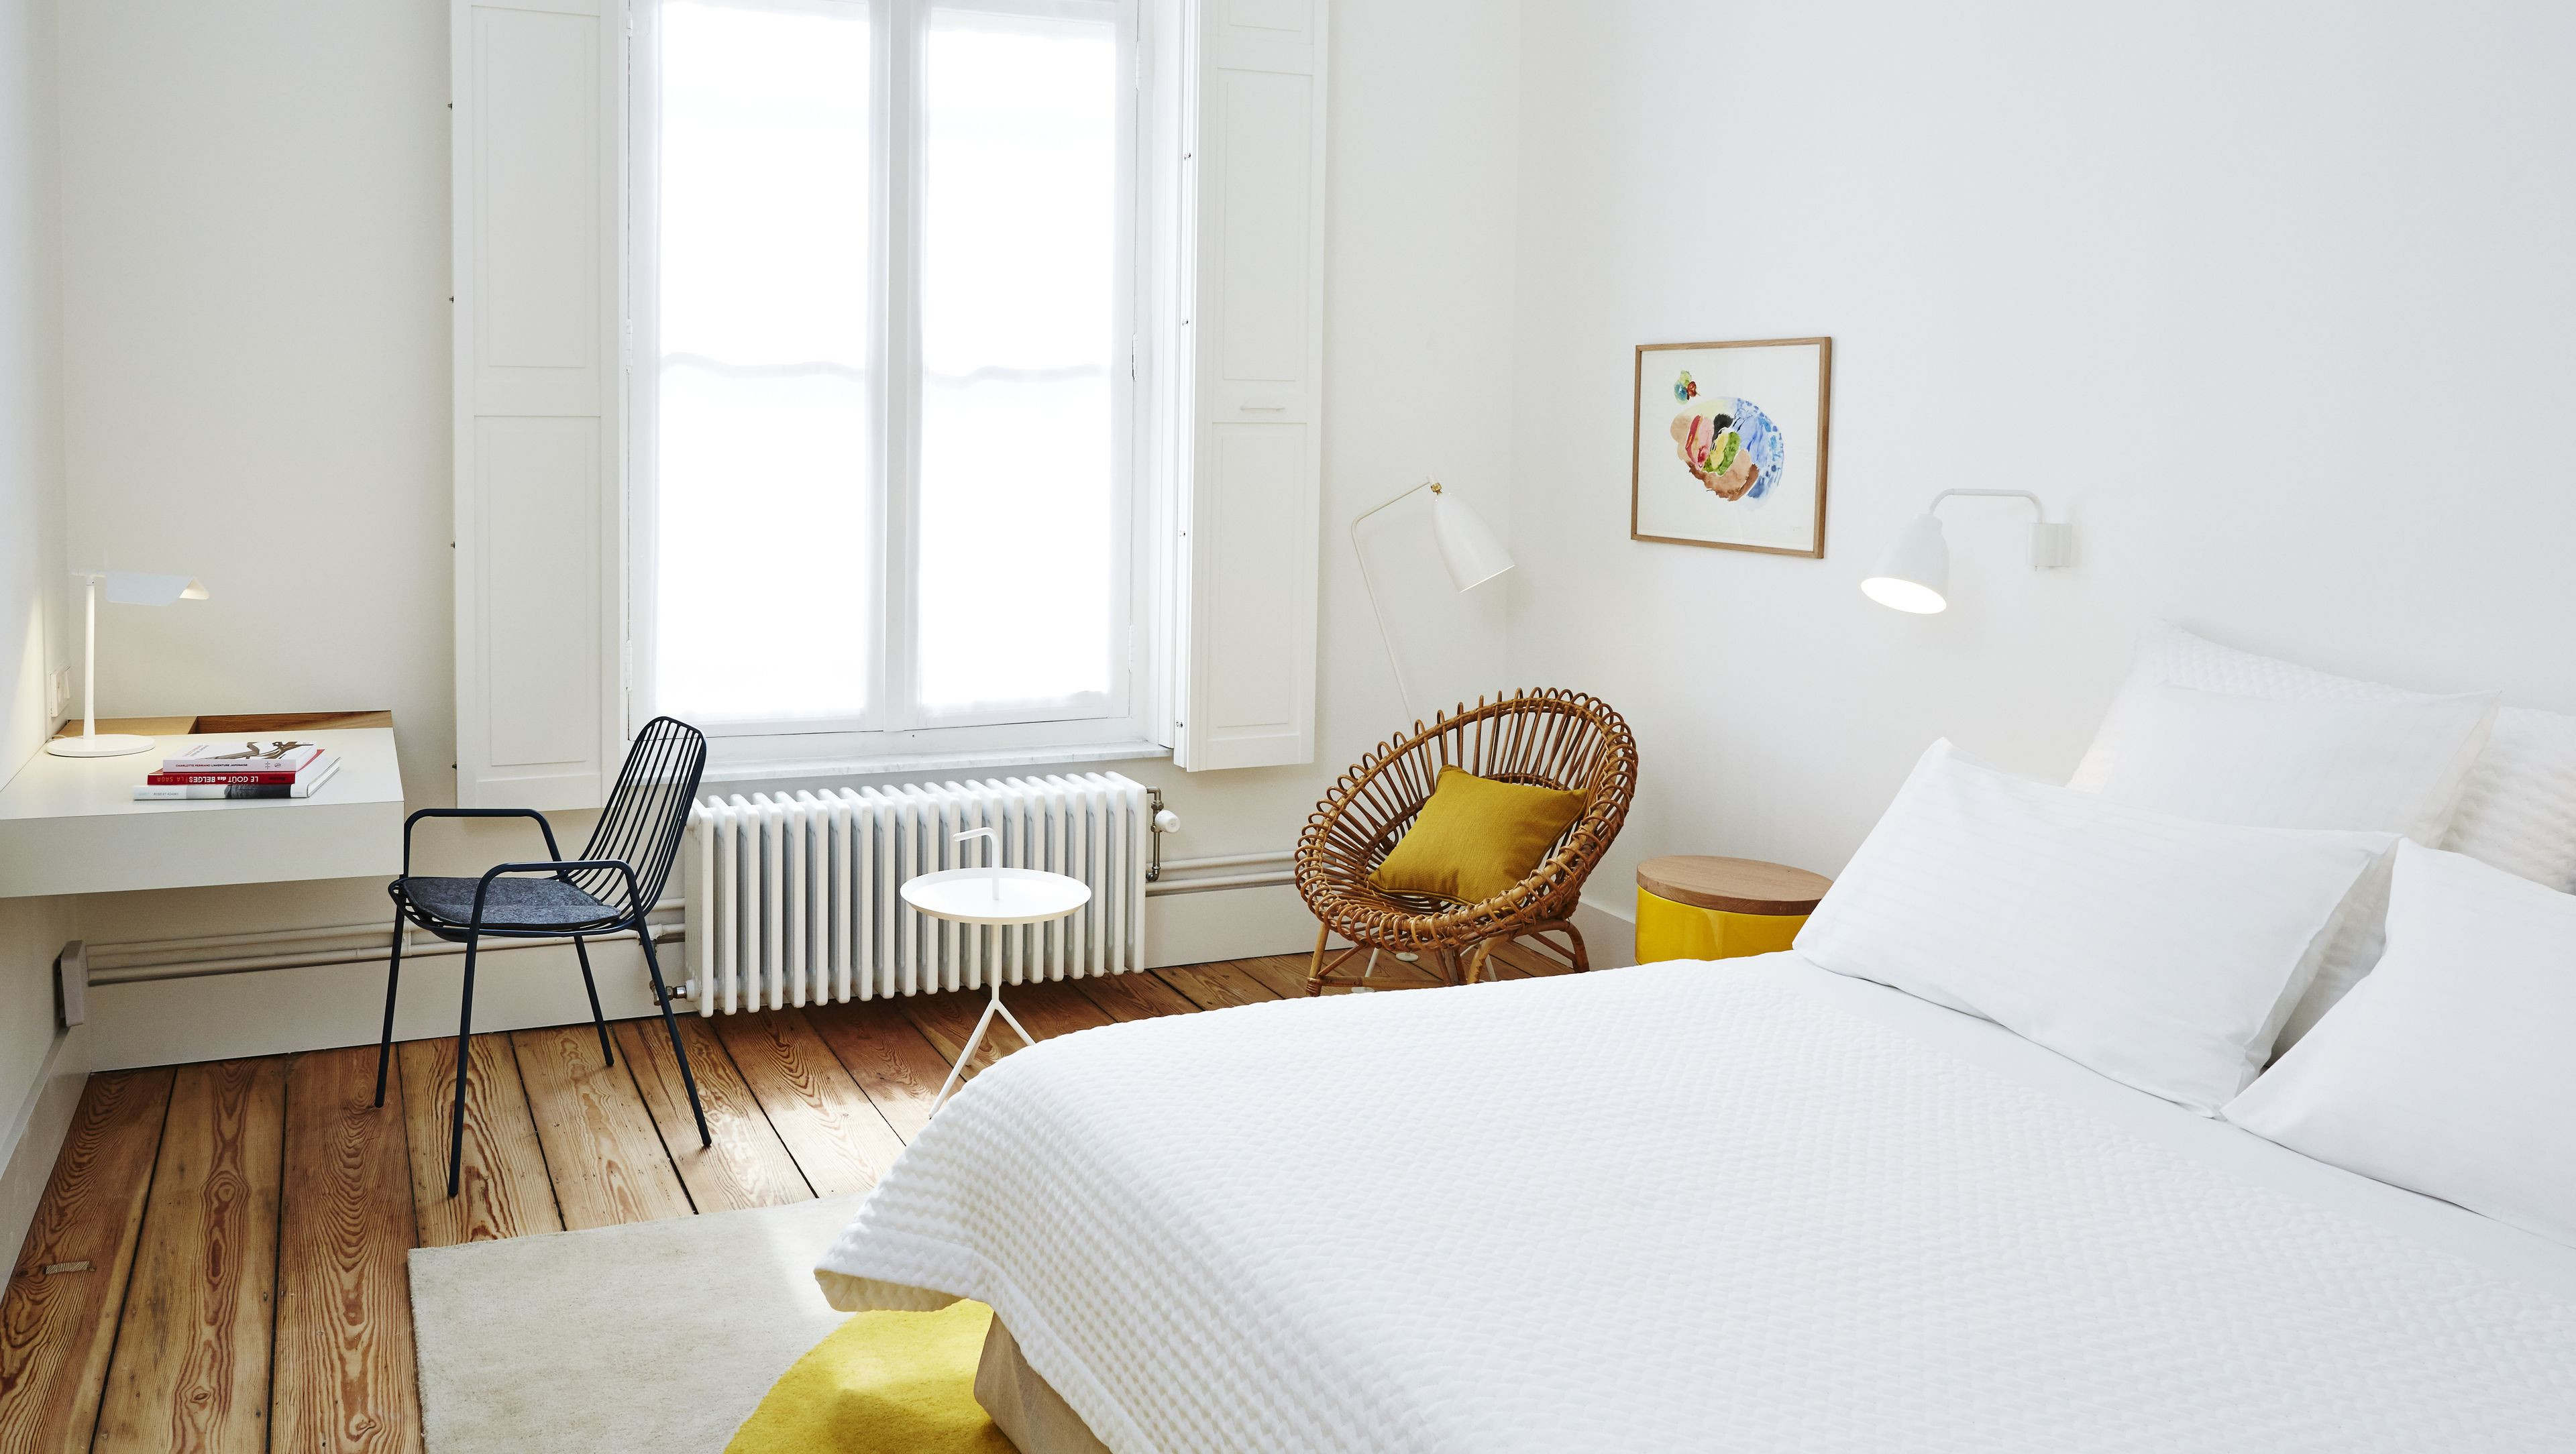 Courtesy of Hotel des Galeries / Expedia.com